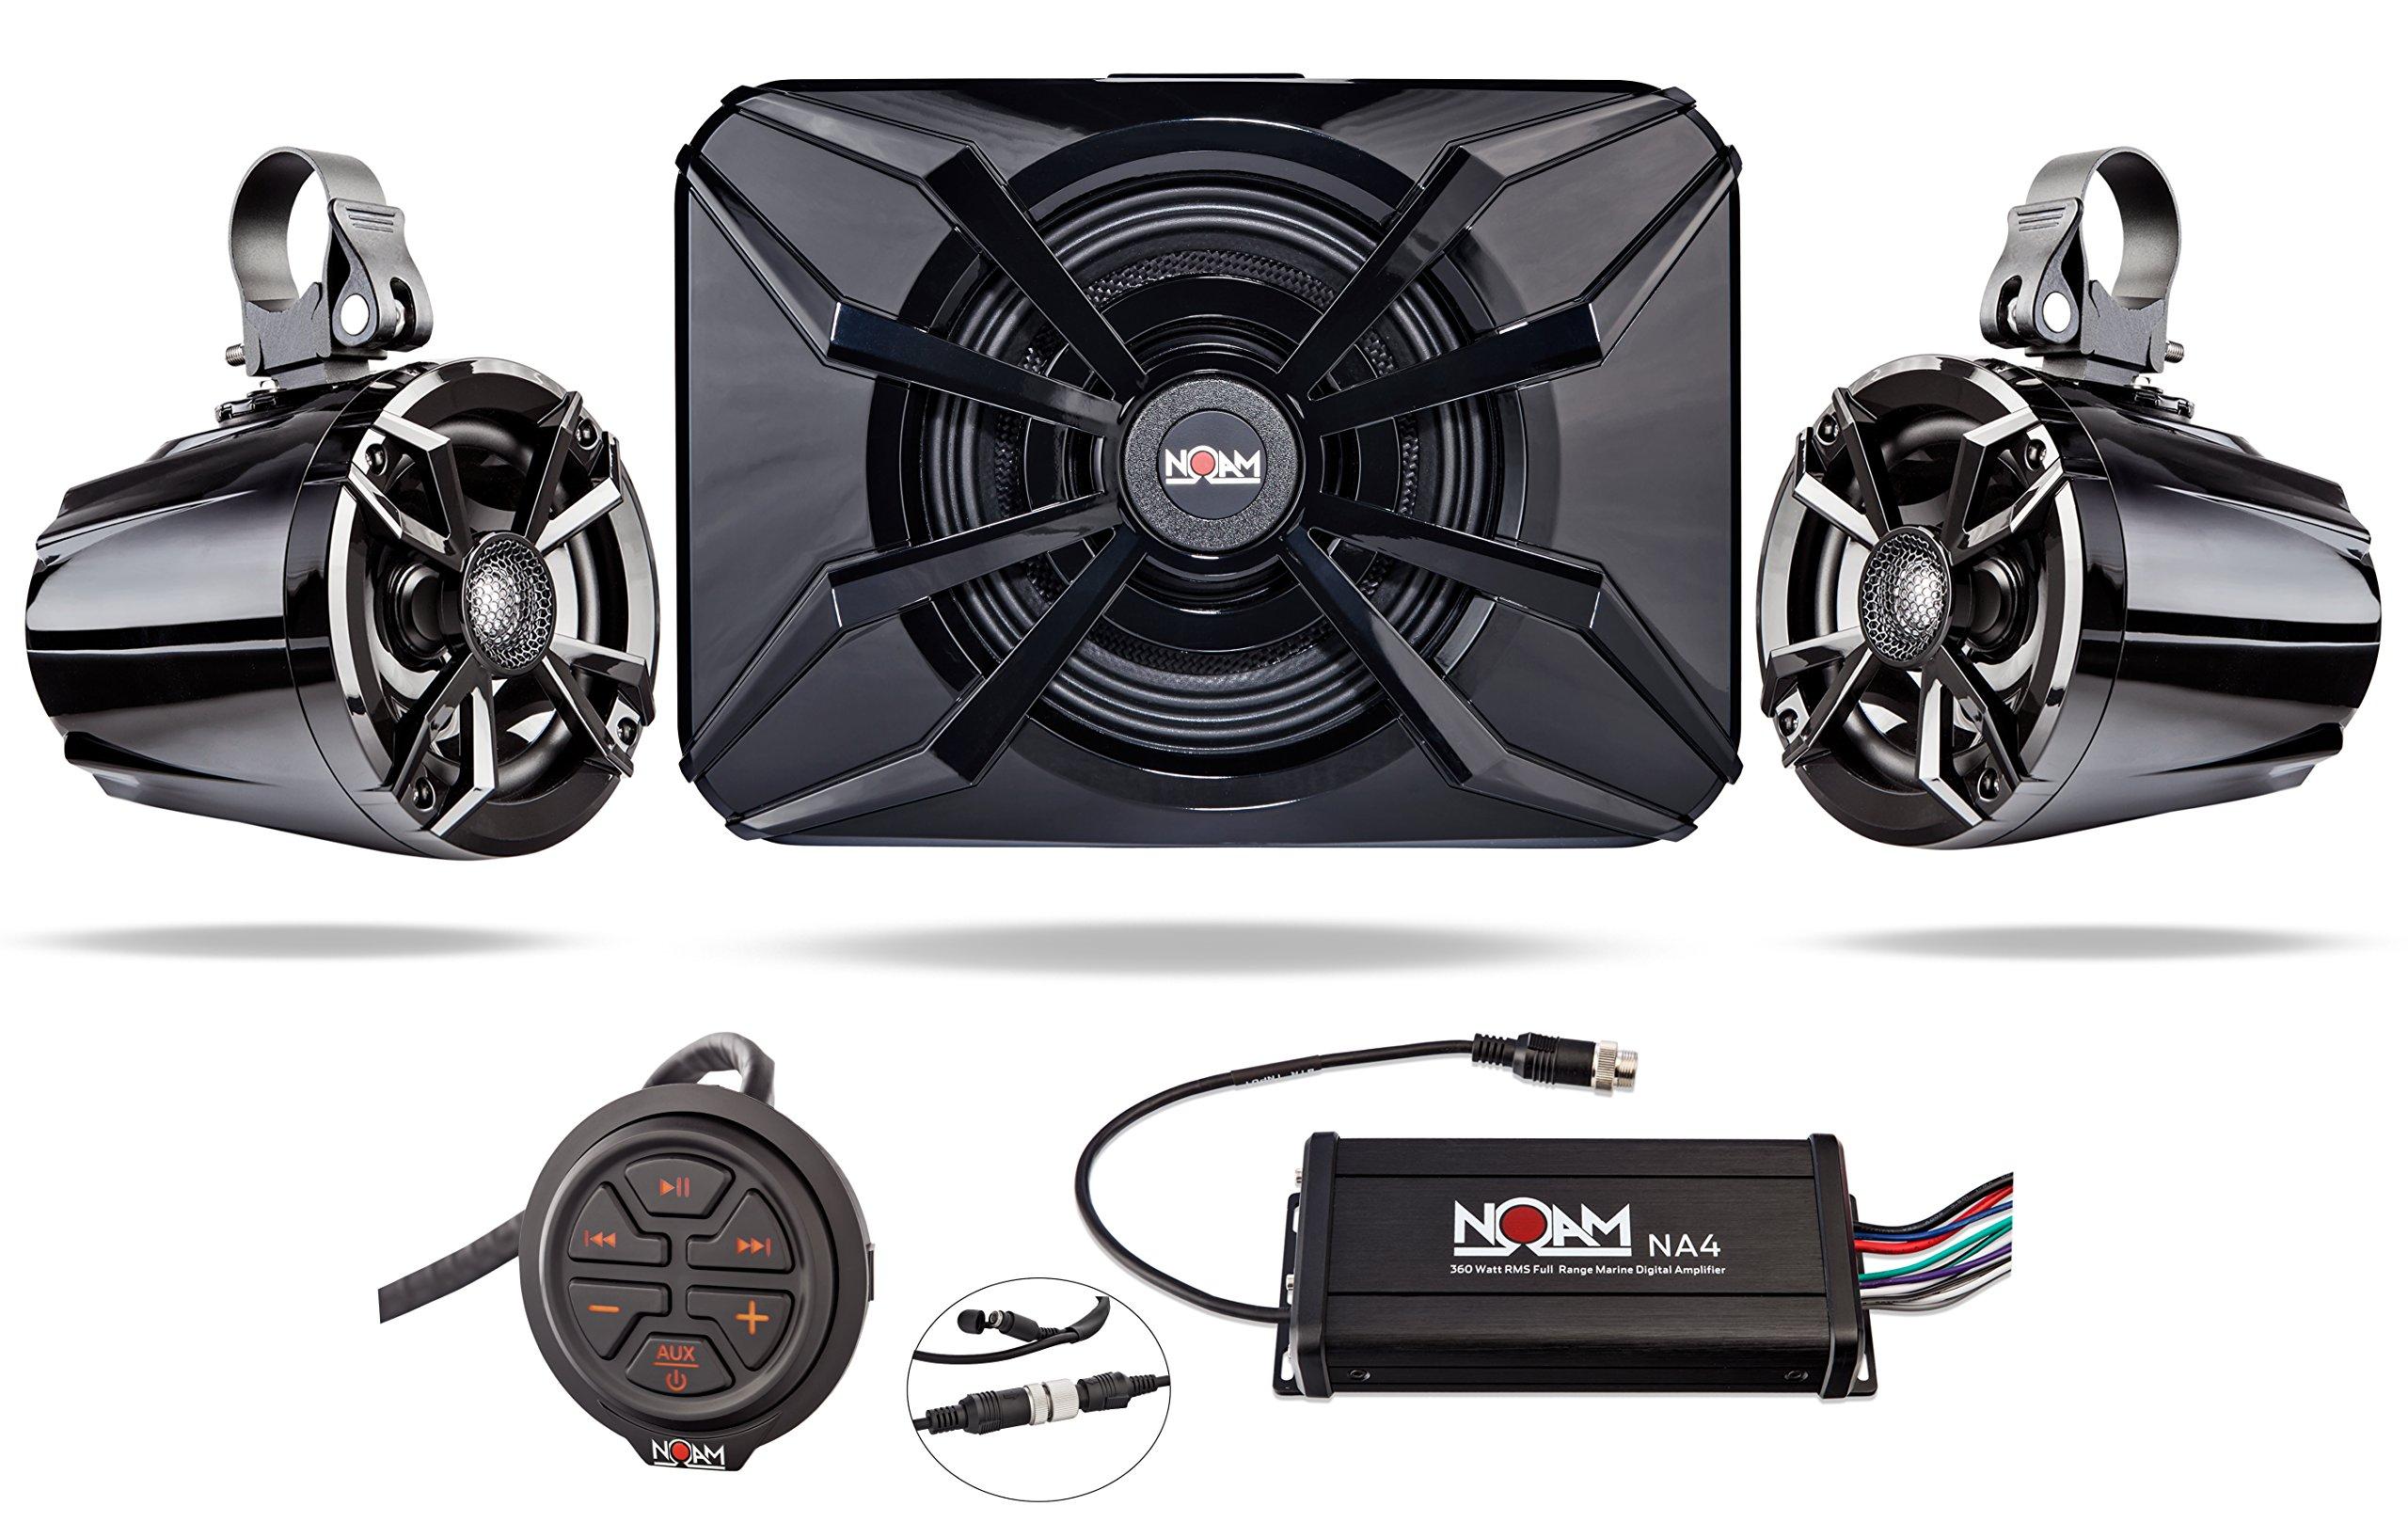 NOAM NUTV5-S - ATV / Golf Cart / UTV Waterproof Speakers Bluetooth 2.1 Marine Stereo System by NOAM